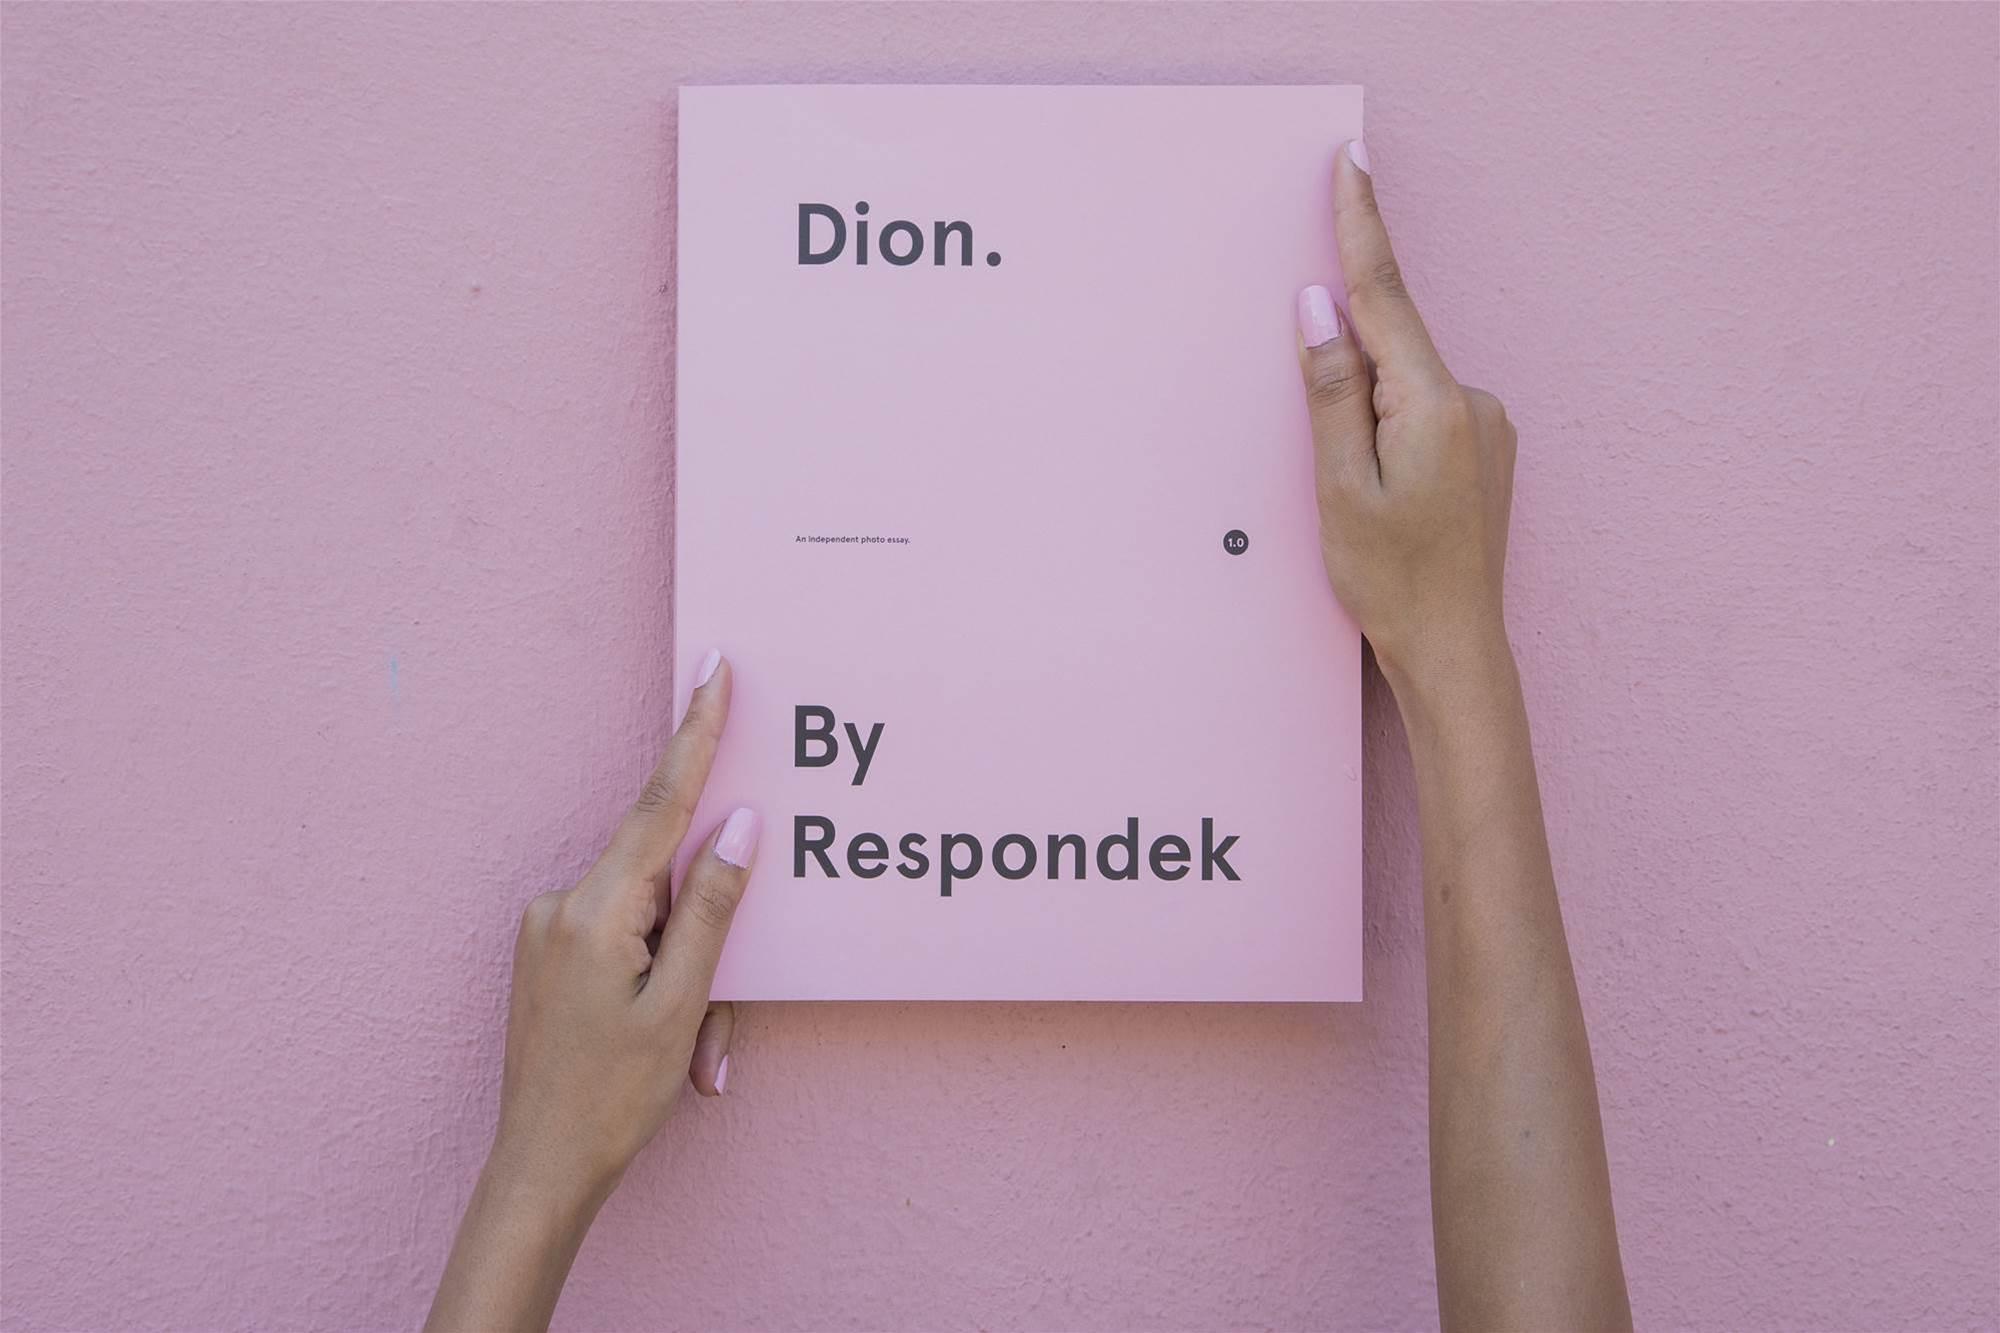 John Respondek announces the launch of 'Dion. By Respondek'